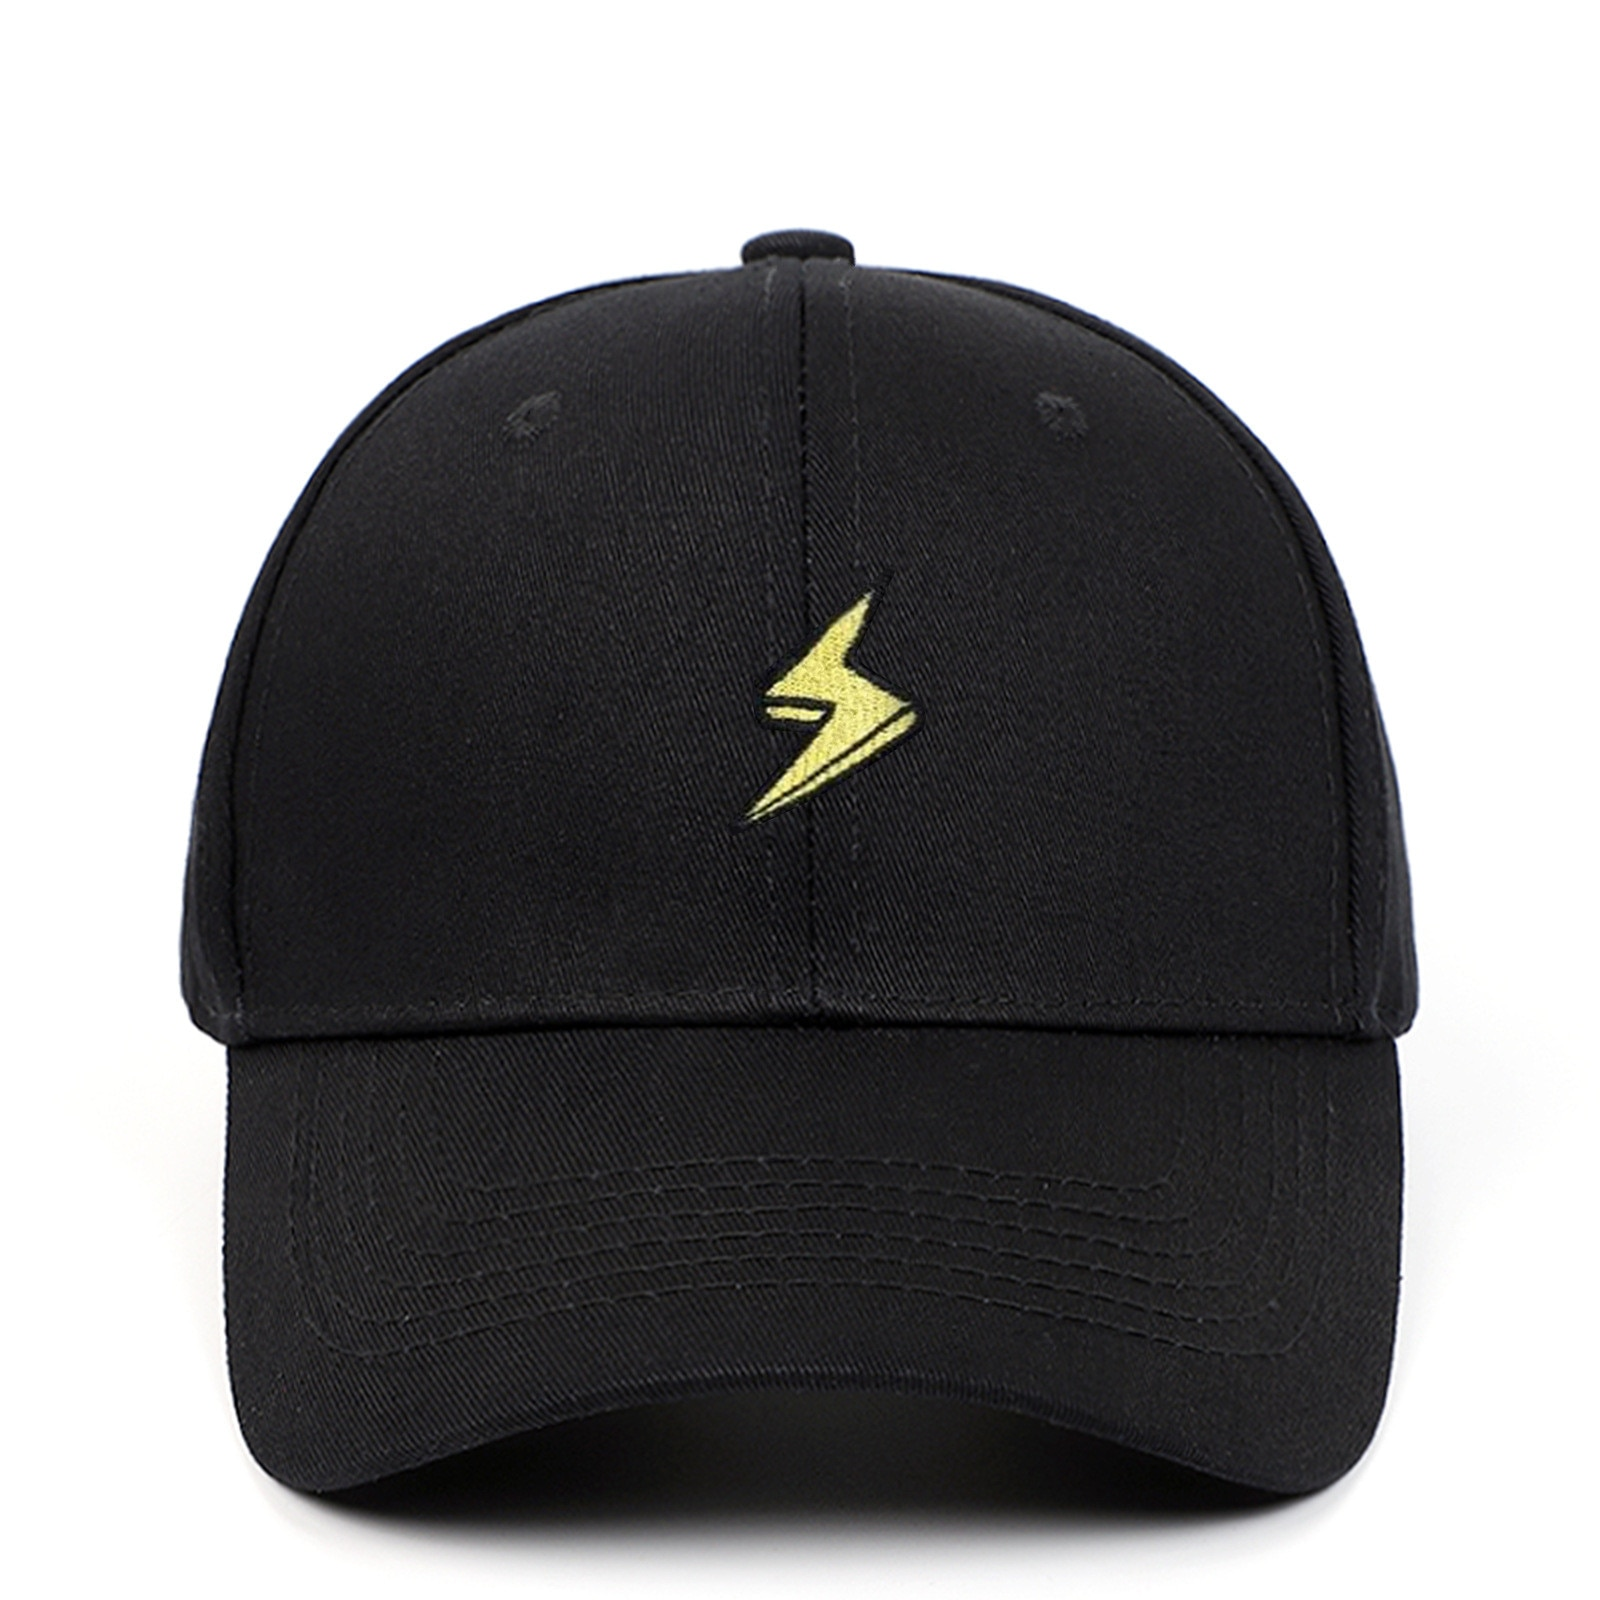 lightning baseball cap hip hop embroidered men dad hat hiphop snapack hat cotton kpop curved sunhat